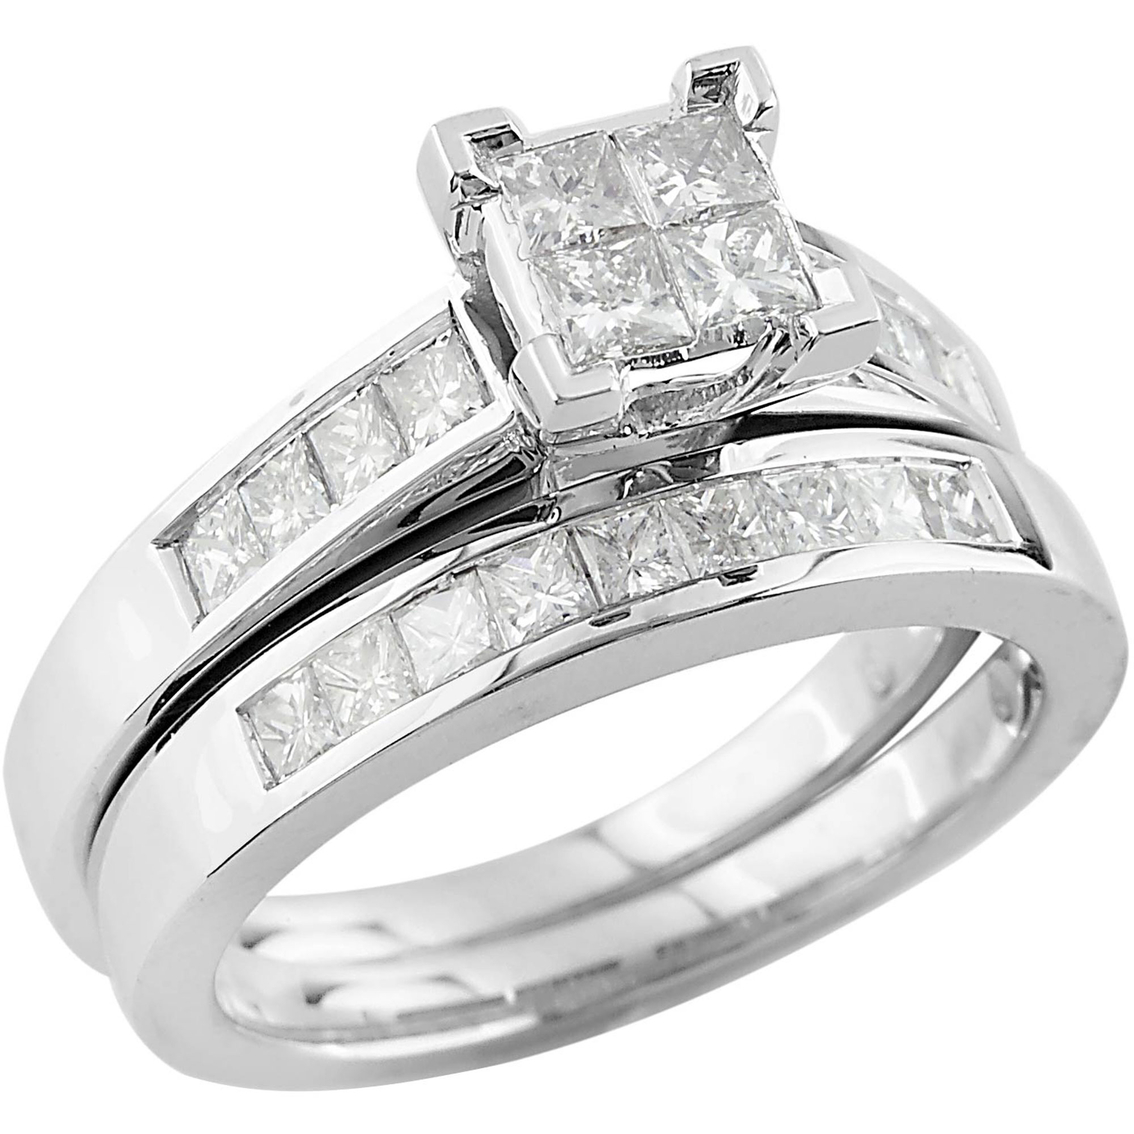 14k White Gold 1 Ctw Princess Cut Quad Cluster Diamond Bridal Set